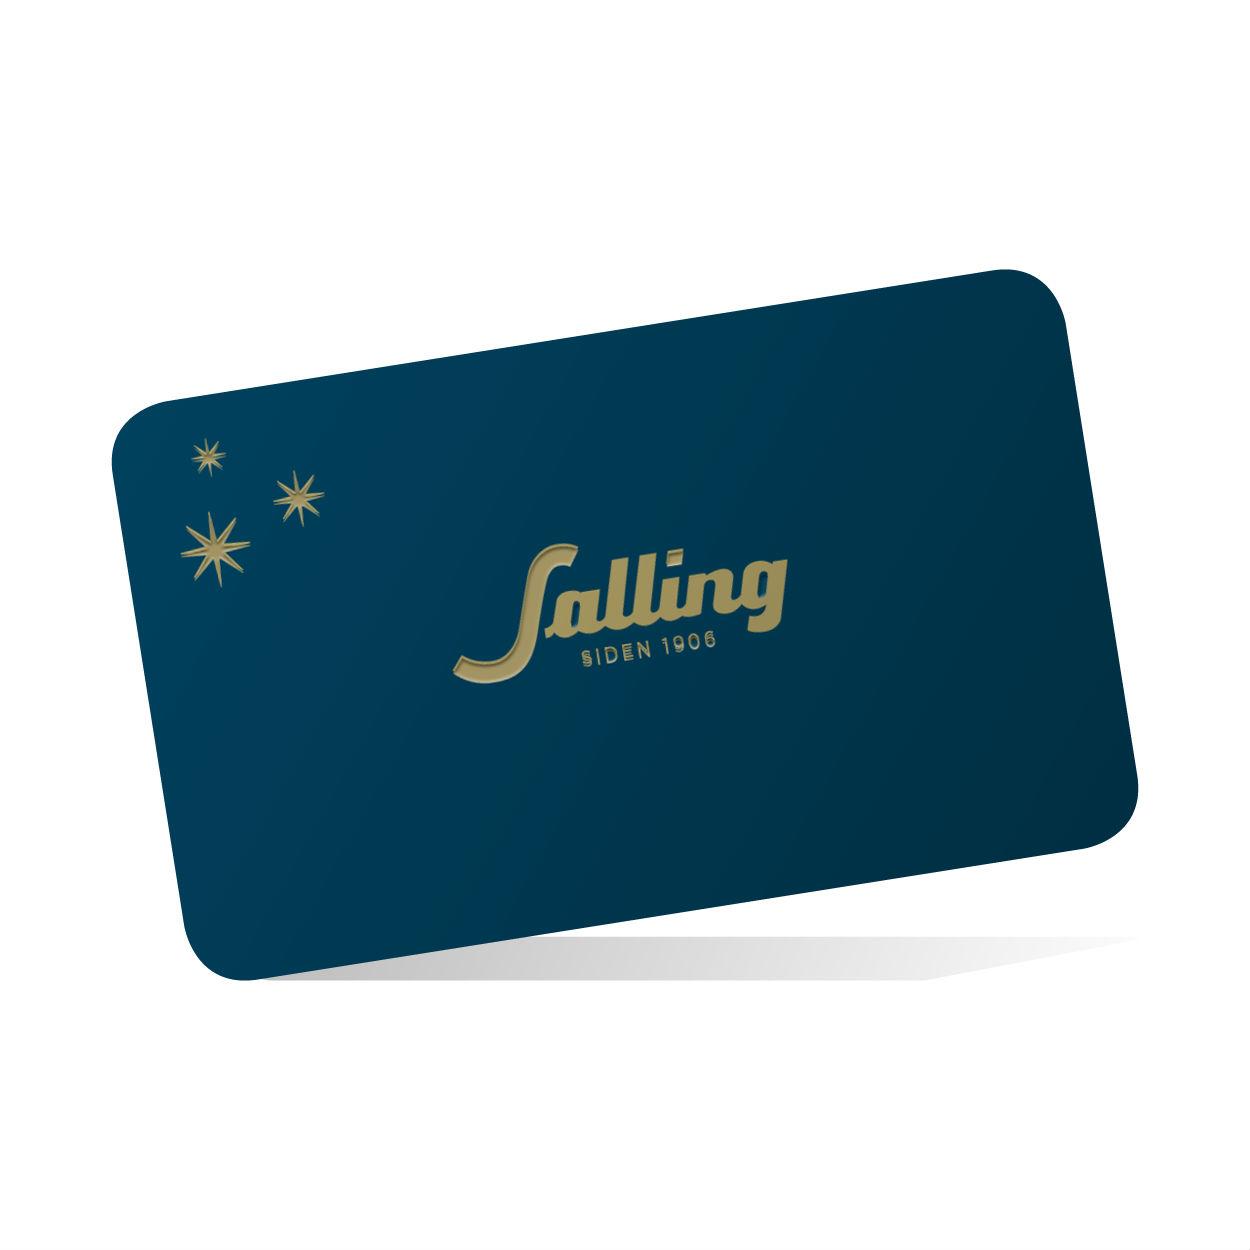 Salling gavekort - 550 kr